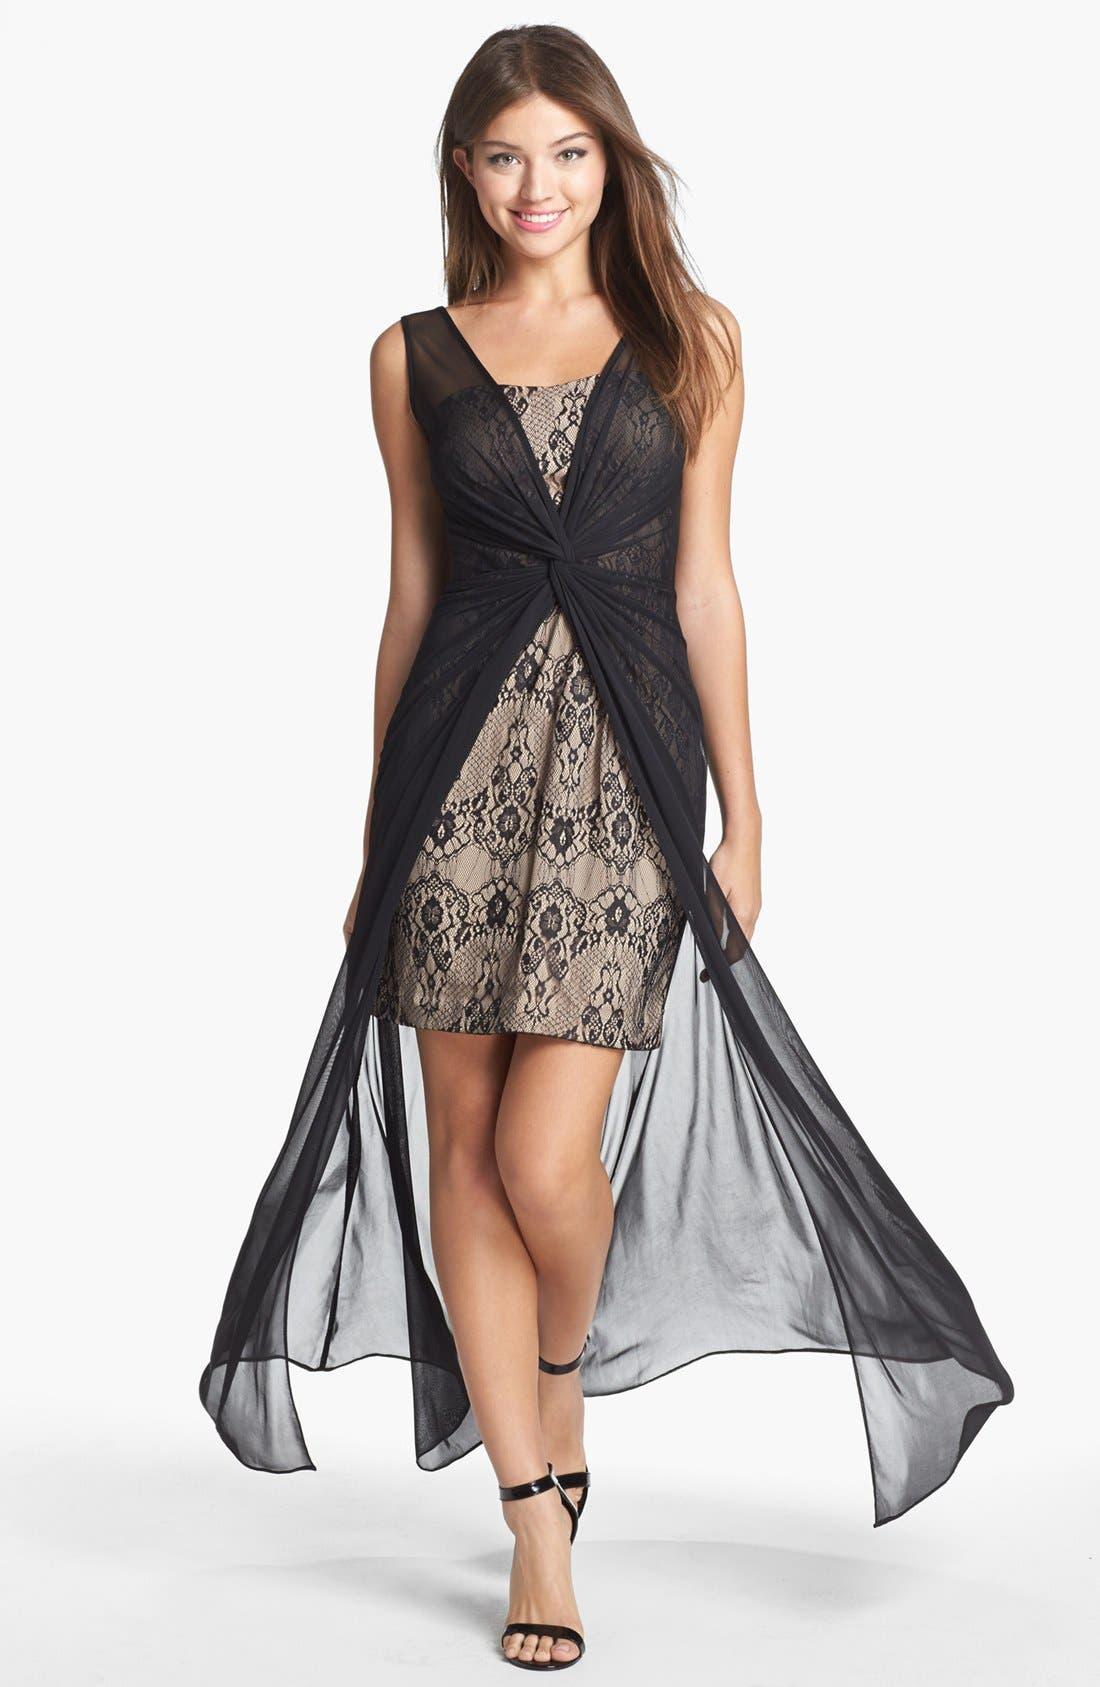 Main Image - Hailey by Adrianna Papell Chiffon Overlay Lace Sheath Dress